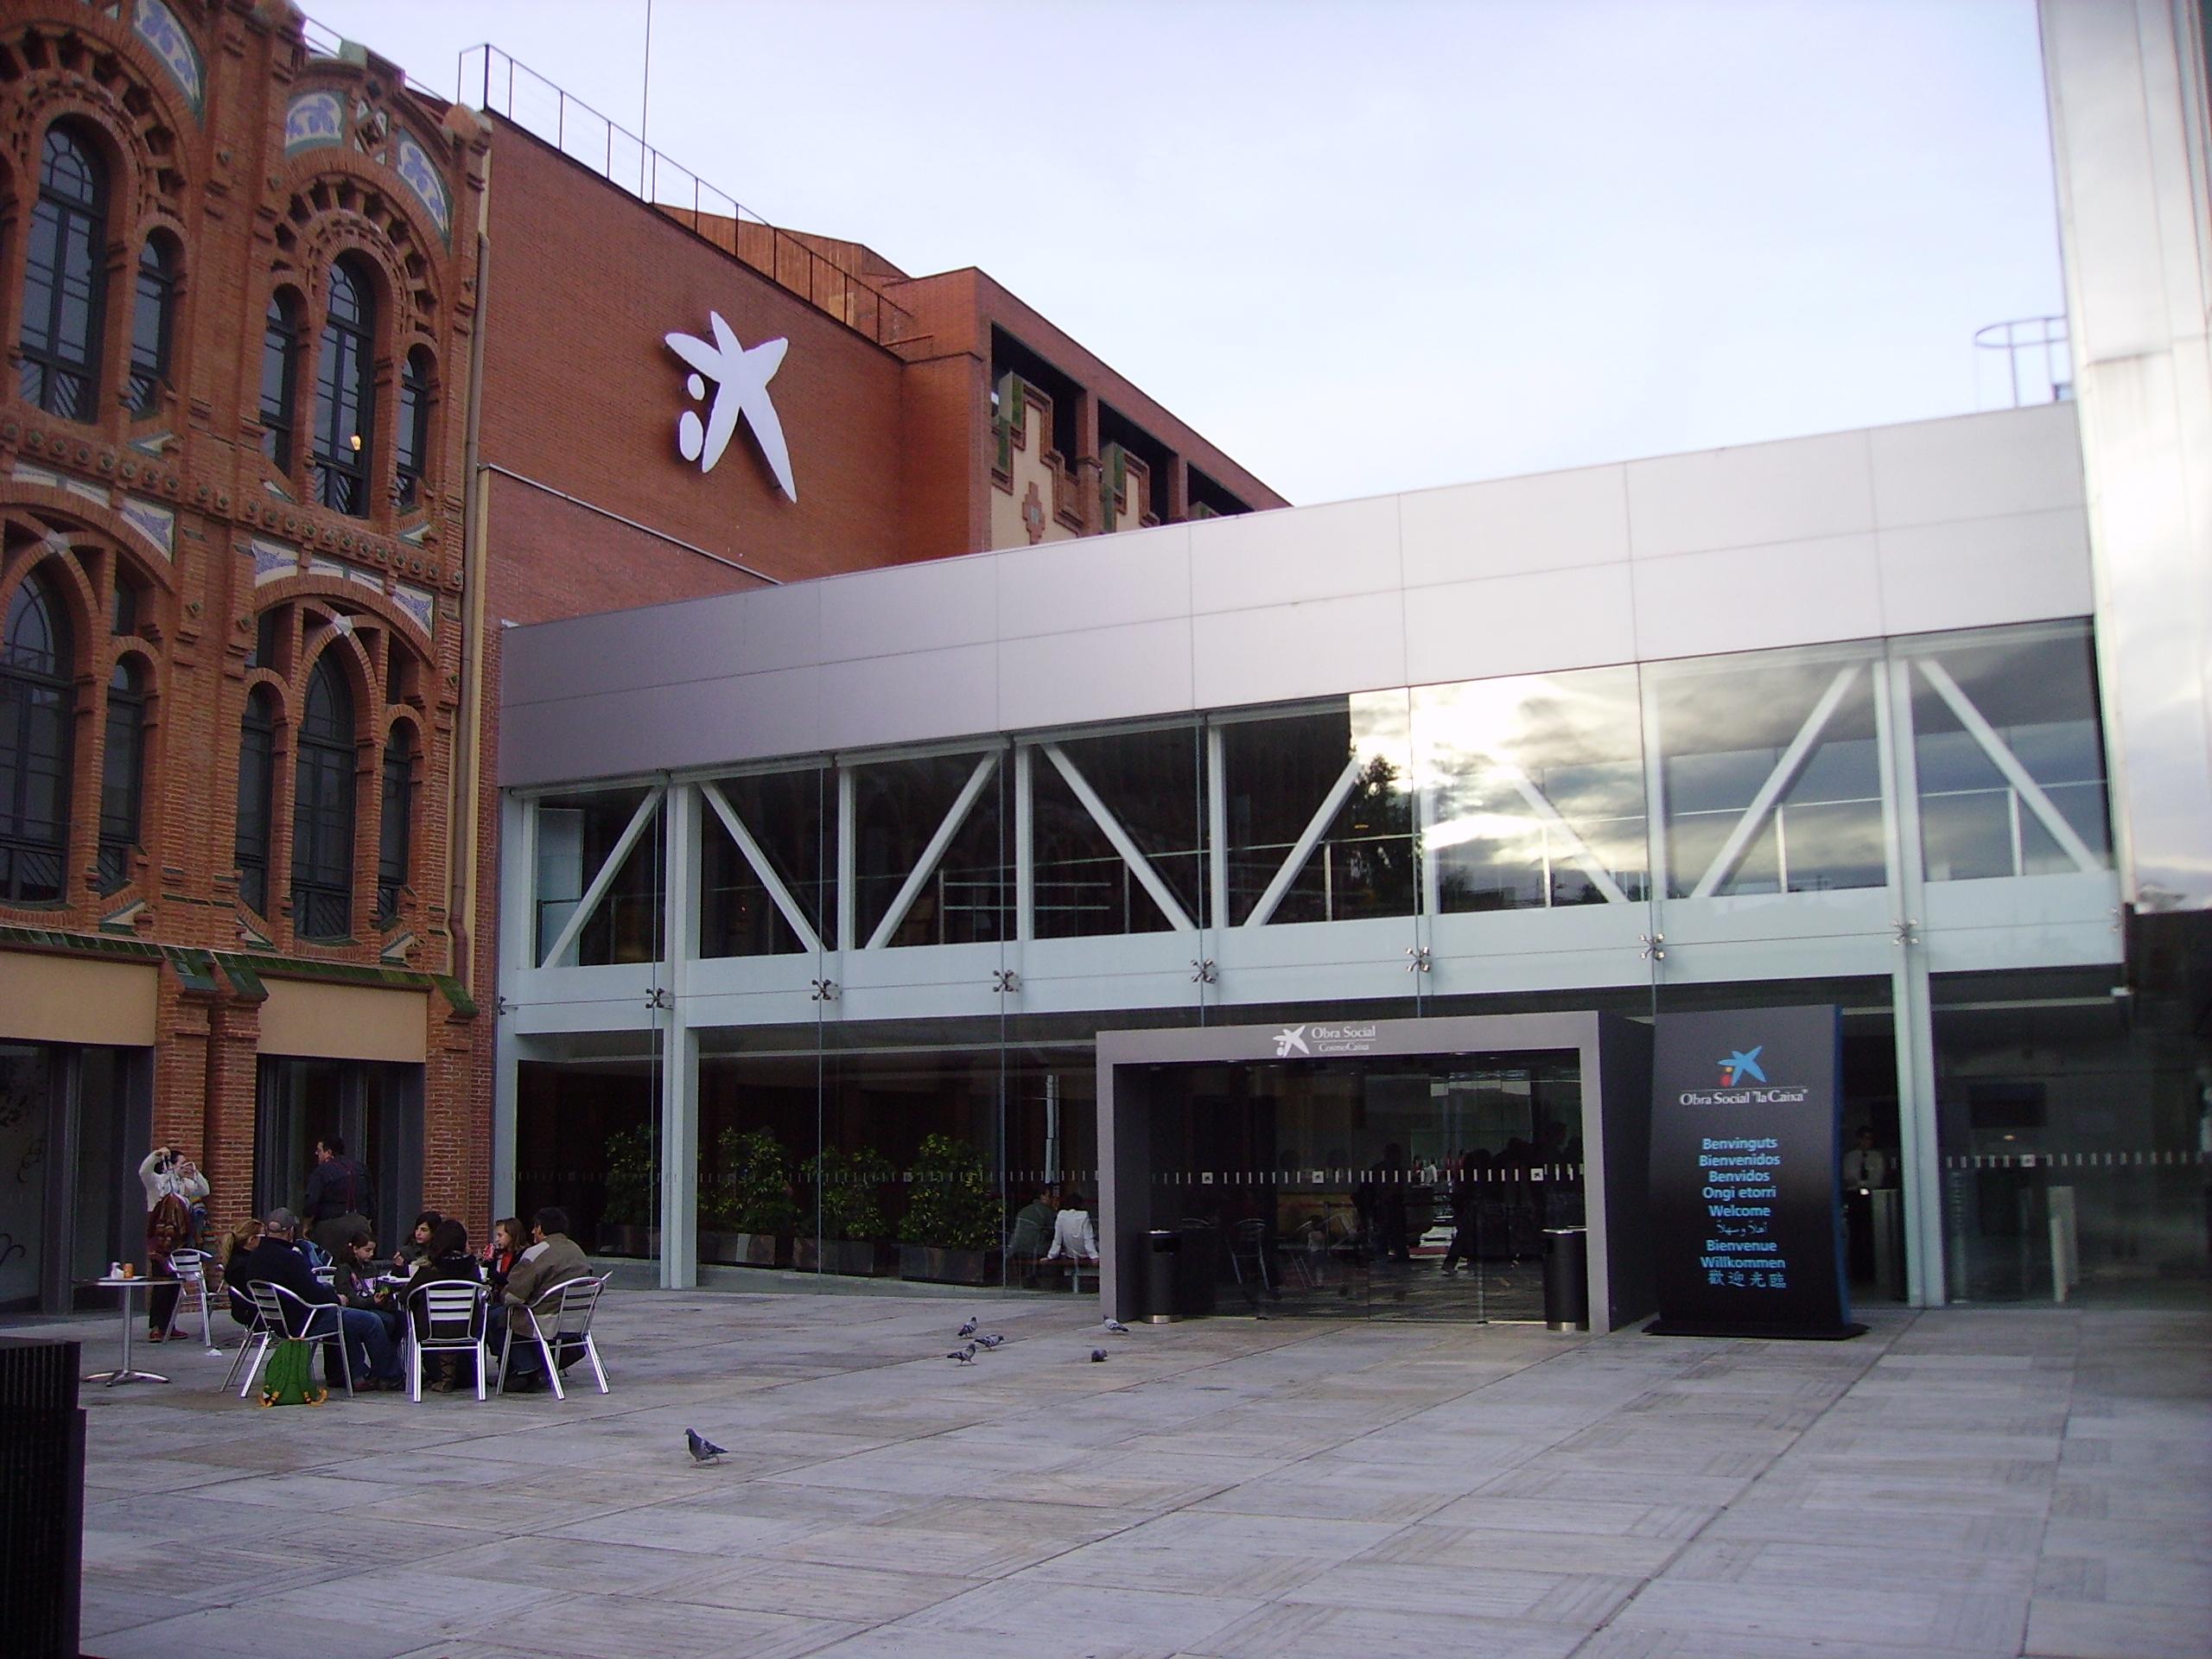 File:CosmoCaixa Museu Barcelona.JPG - Wikimedia Commons